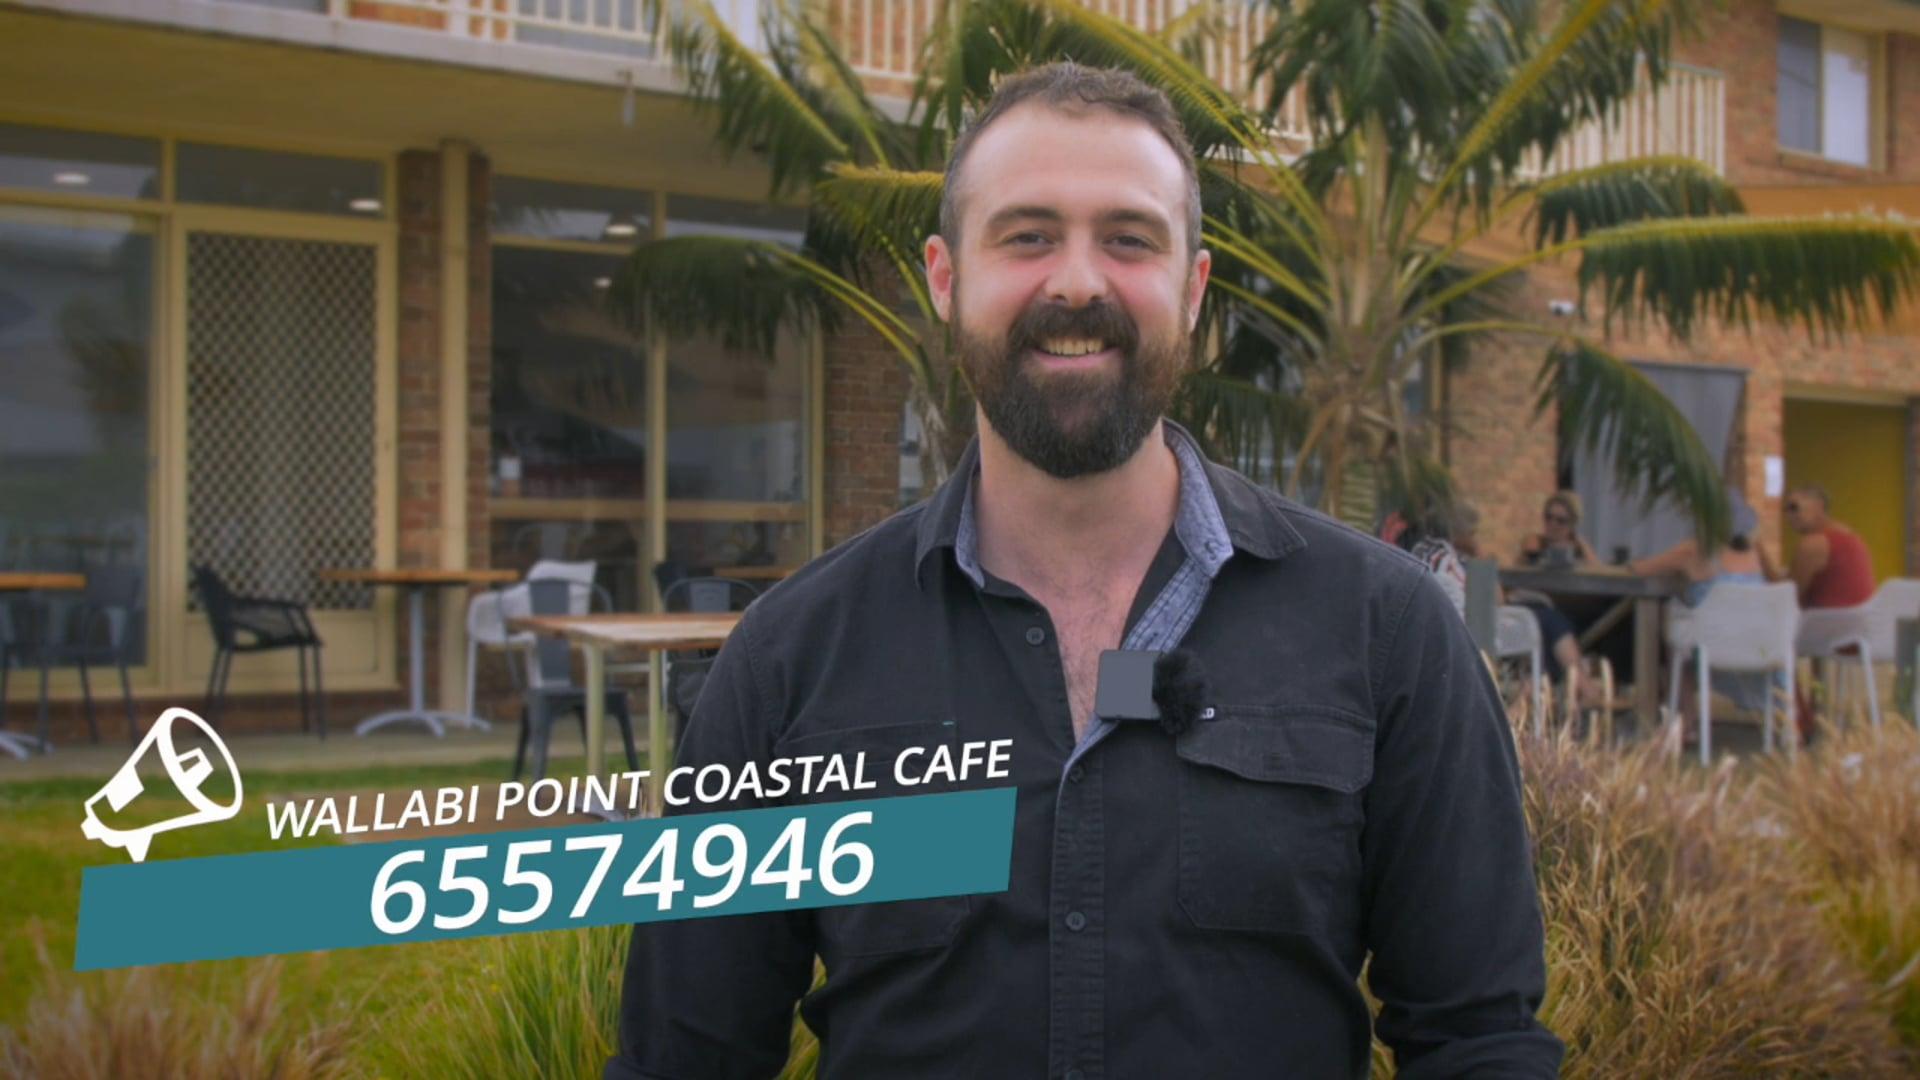 Wallabi Point Coastal Cafe - Wallabi Point